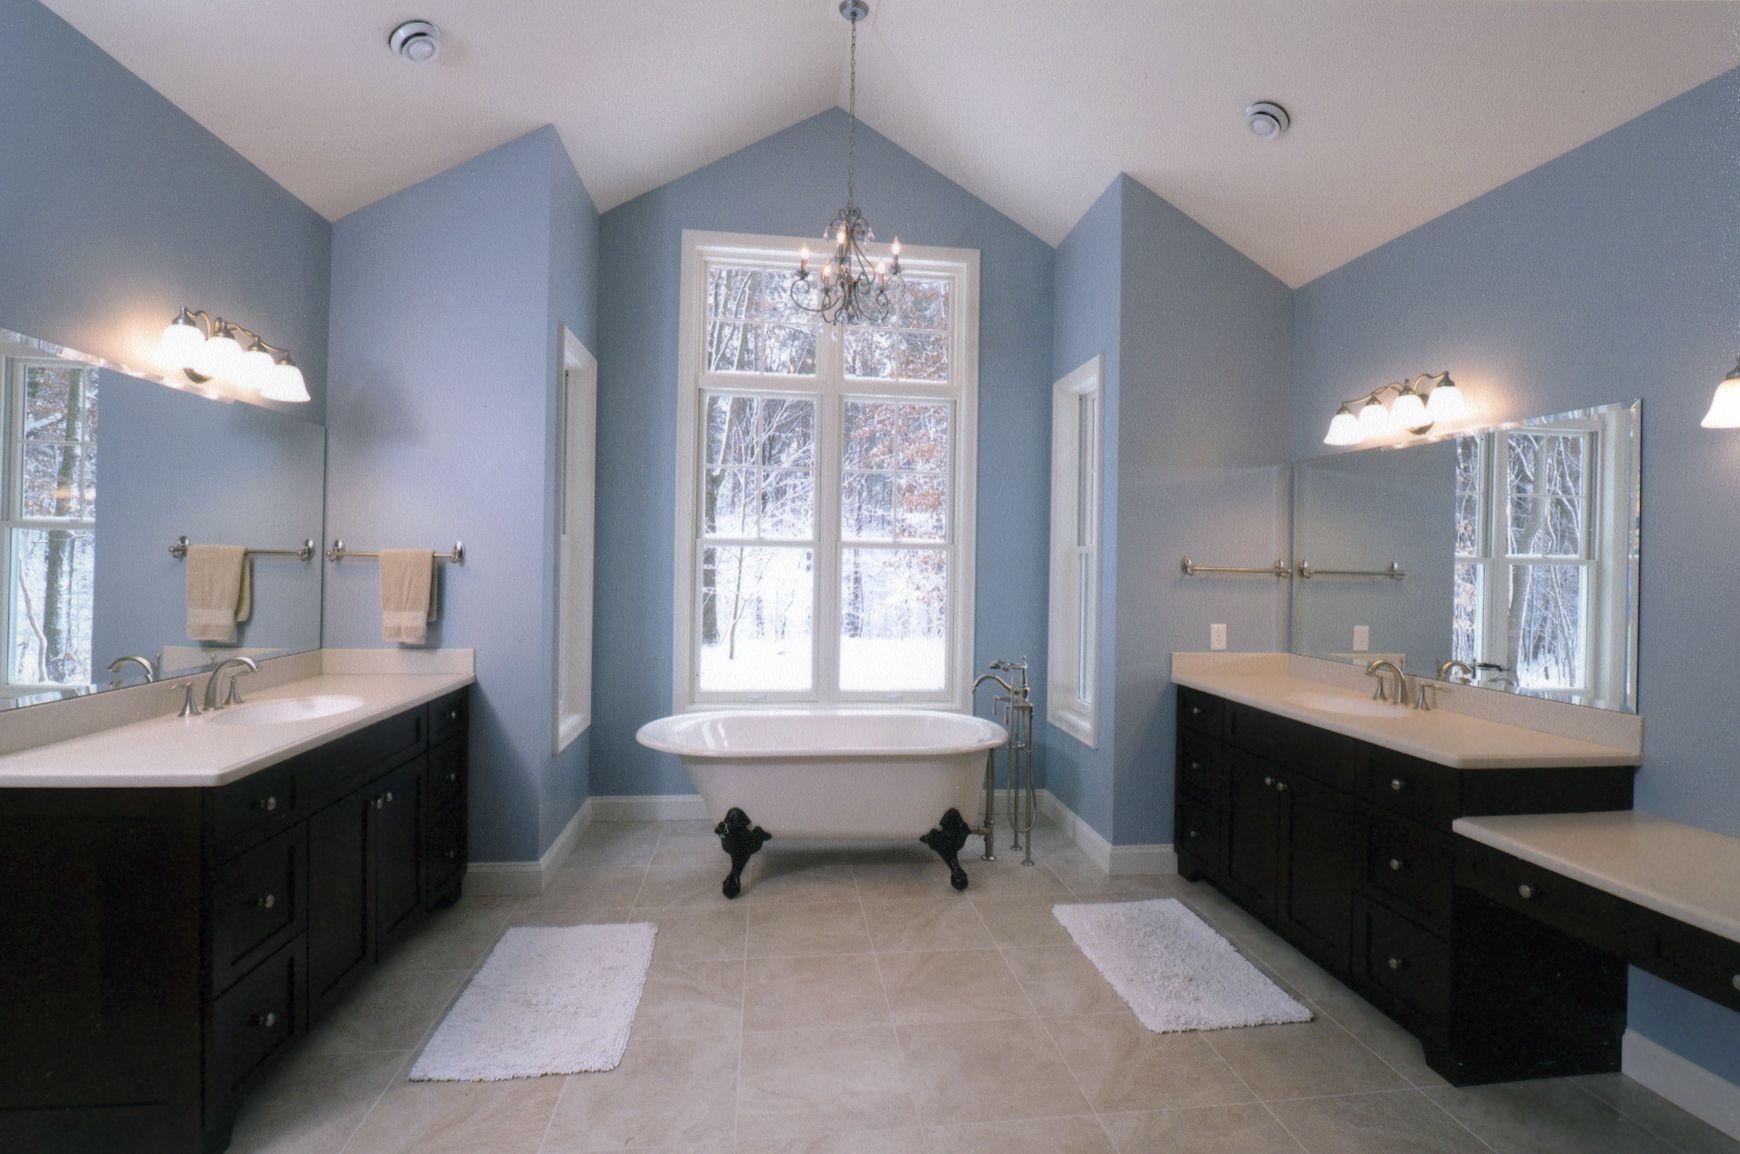 Bathroom Color Pallet Dark Or Black Vanity Light Floor Sky Blue Walls Blue How To Prop Blue Bathroom Decor Brown Bathroom Decor Blue Bathroom